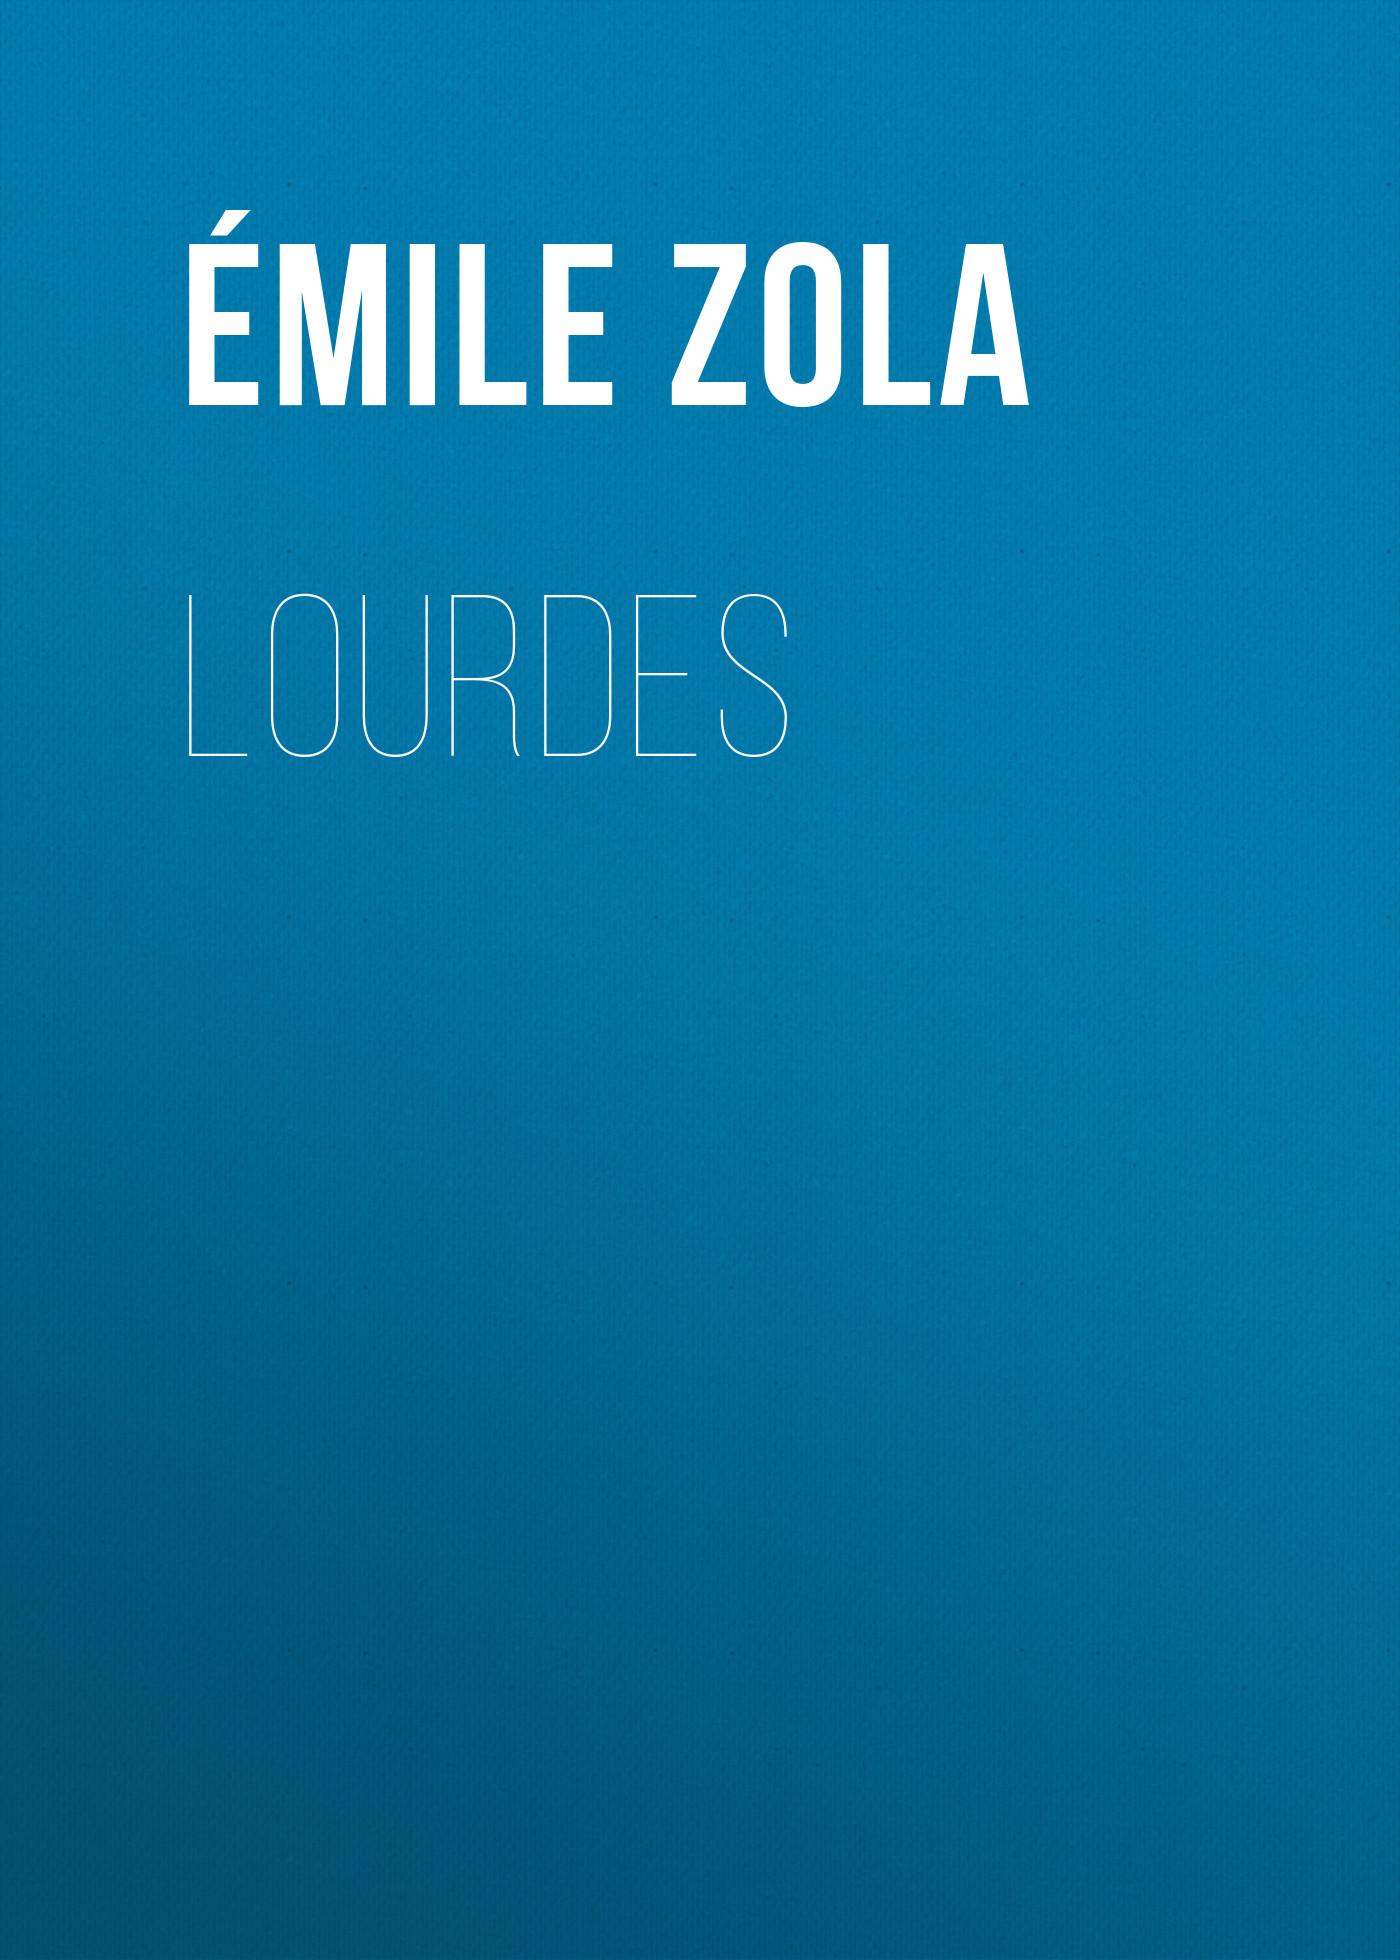 цена на Эмиль Золя Lourdes